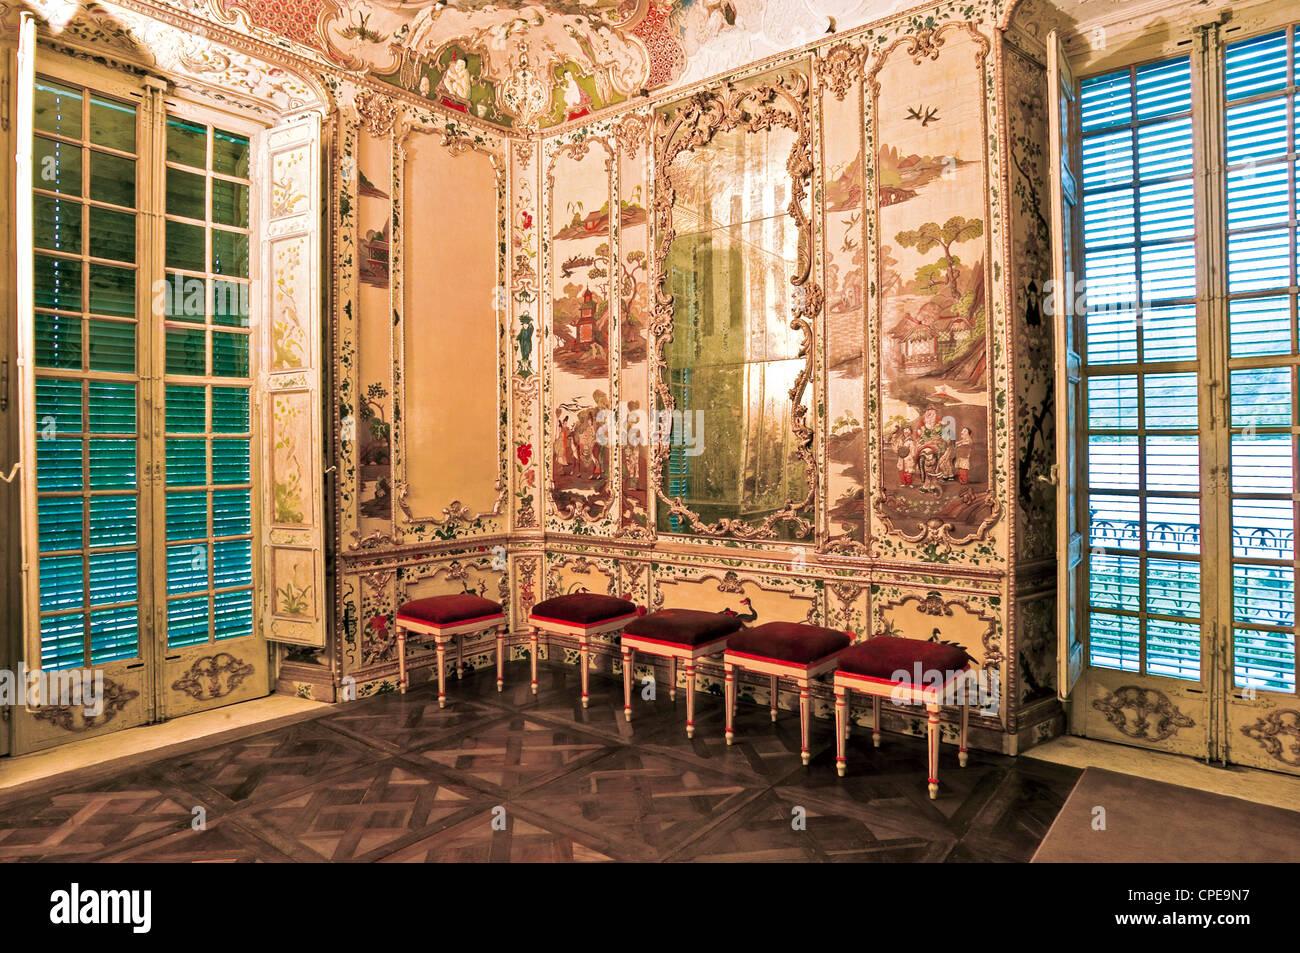 Le Vaisselier à europe italie piémont turin savoy residence villa della regina